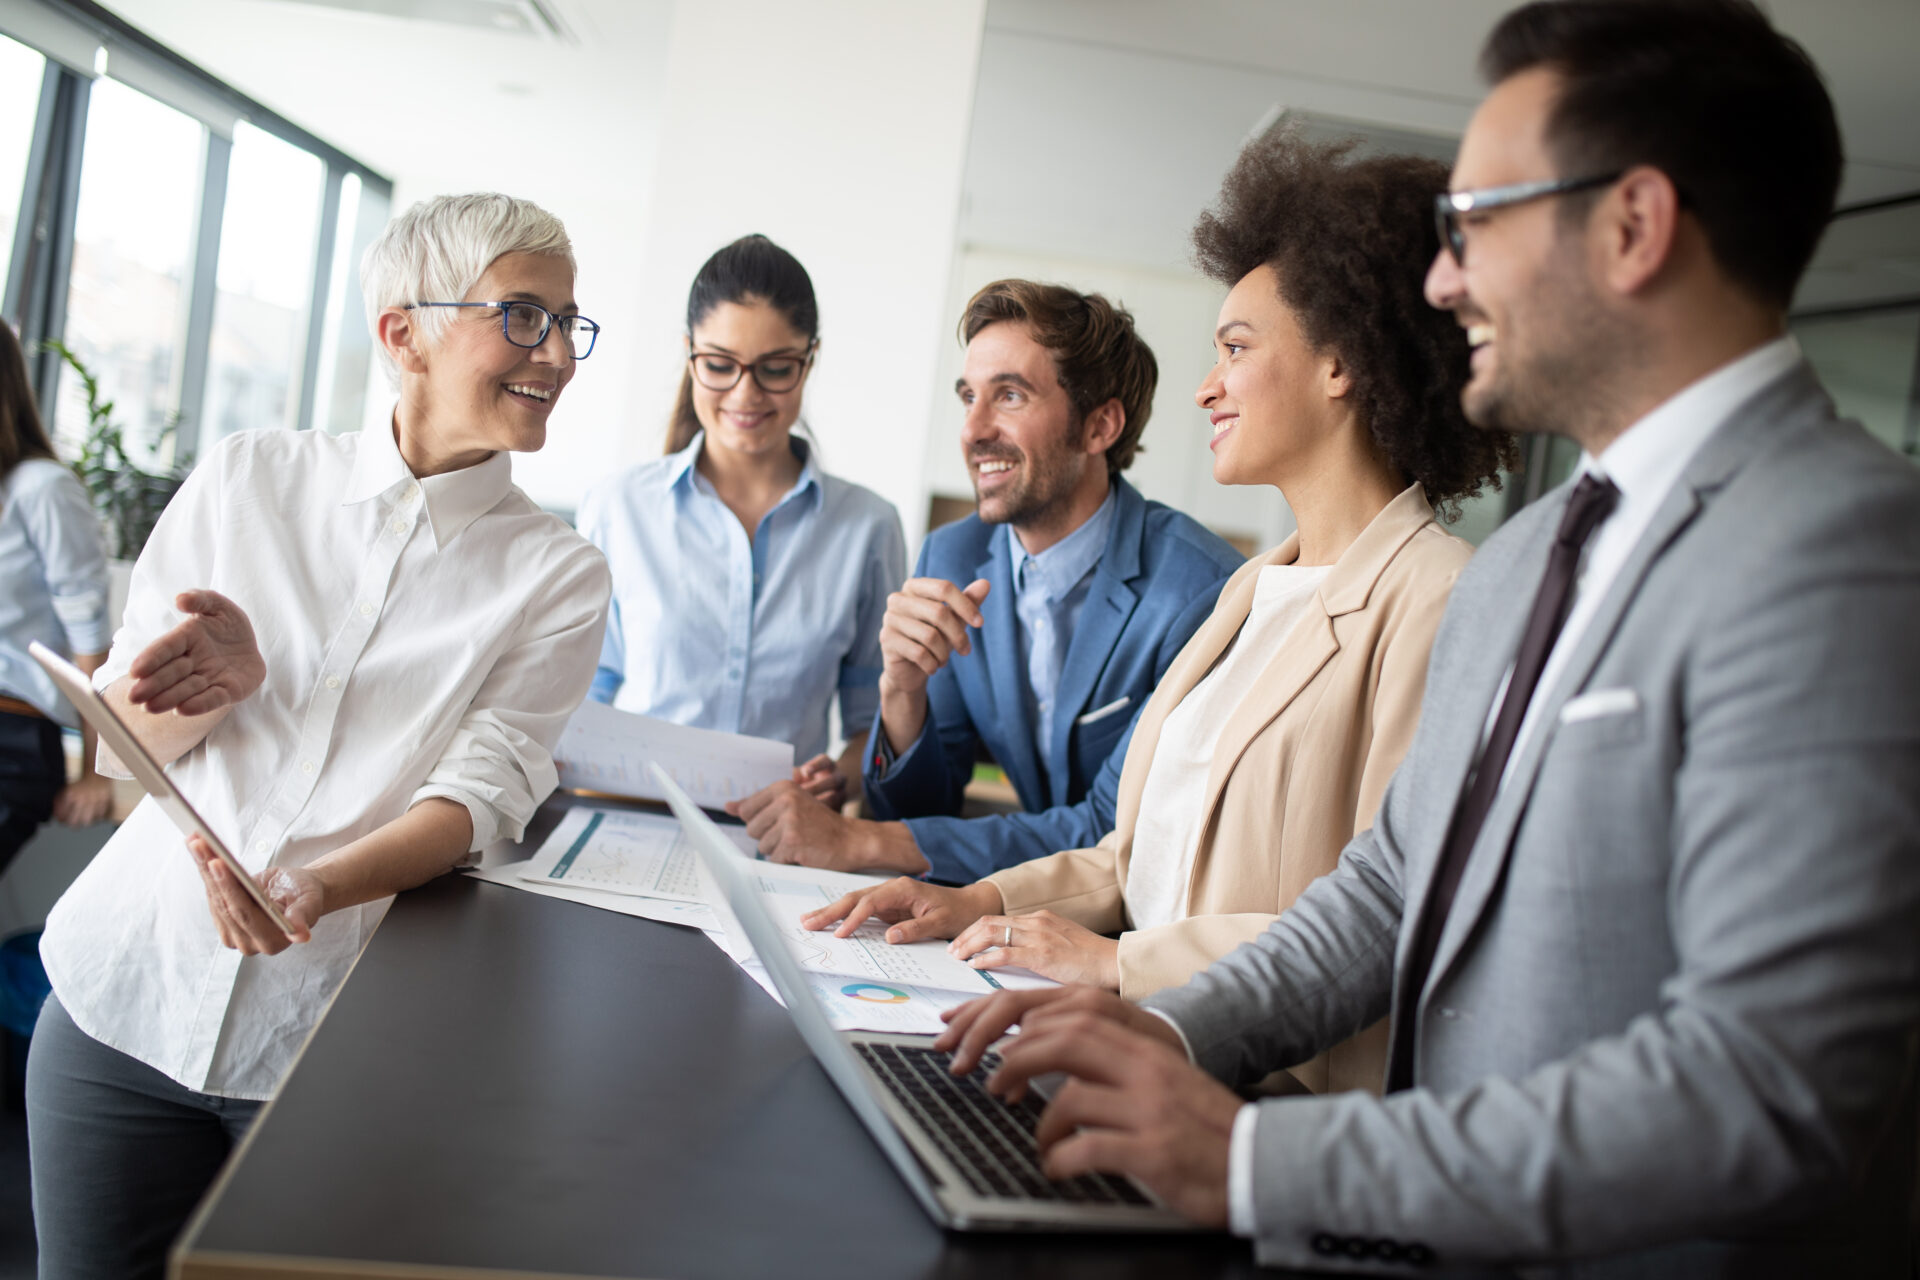 https://enterprise-eq.com/wp-content/uploads/2021/05/happy-business-colleagues-in-modern-office-working-V9Q5MU2-1920x1280.jpg